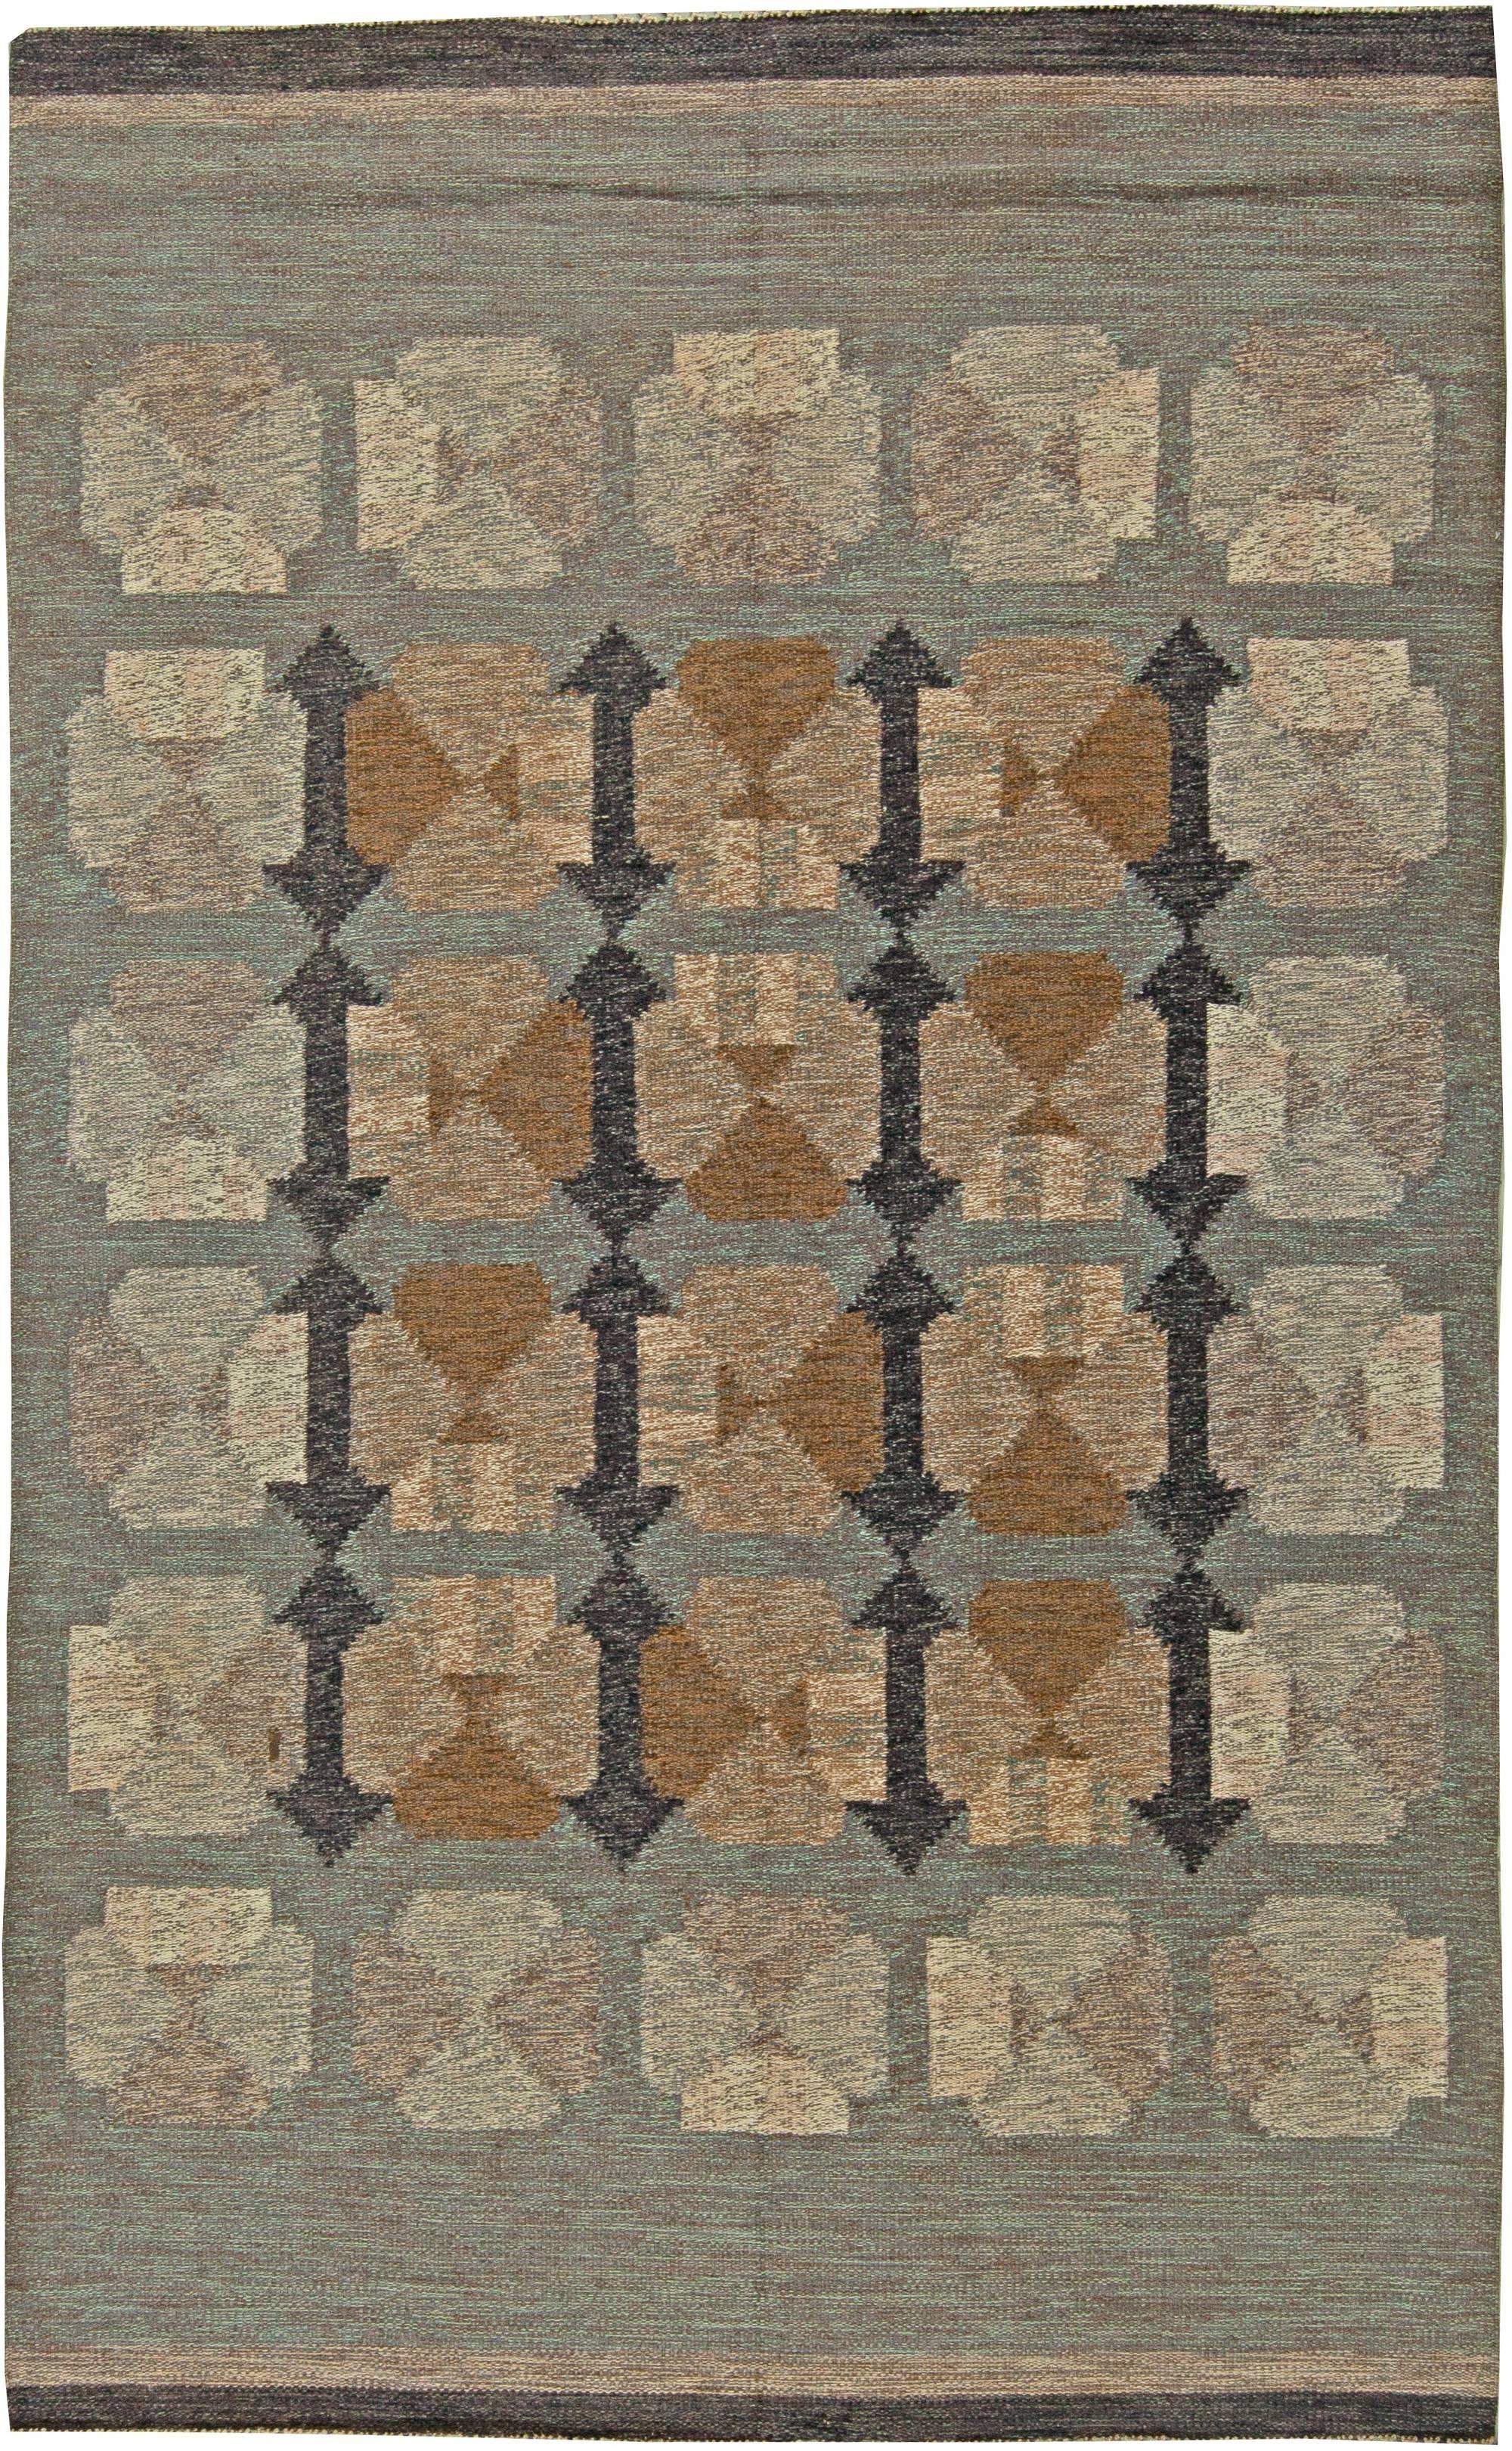 Antique Rug Antique Carpets Antique Persian Rugs Tabriz Rugs Custom Rugs A Swedish Flatweave Rug Bb5838 Scandinavian Rug Rugs Carpet Sale